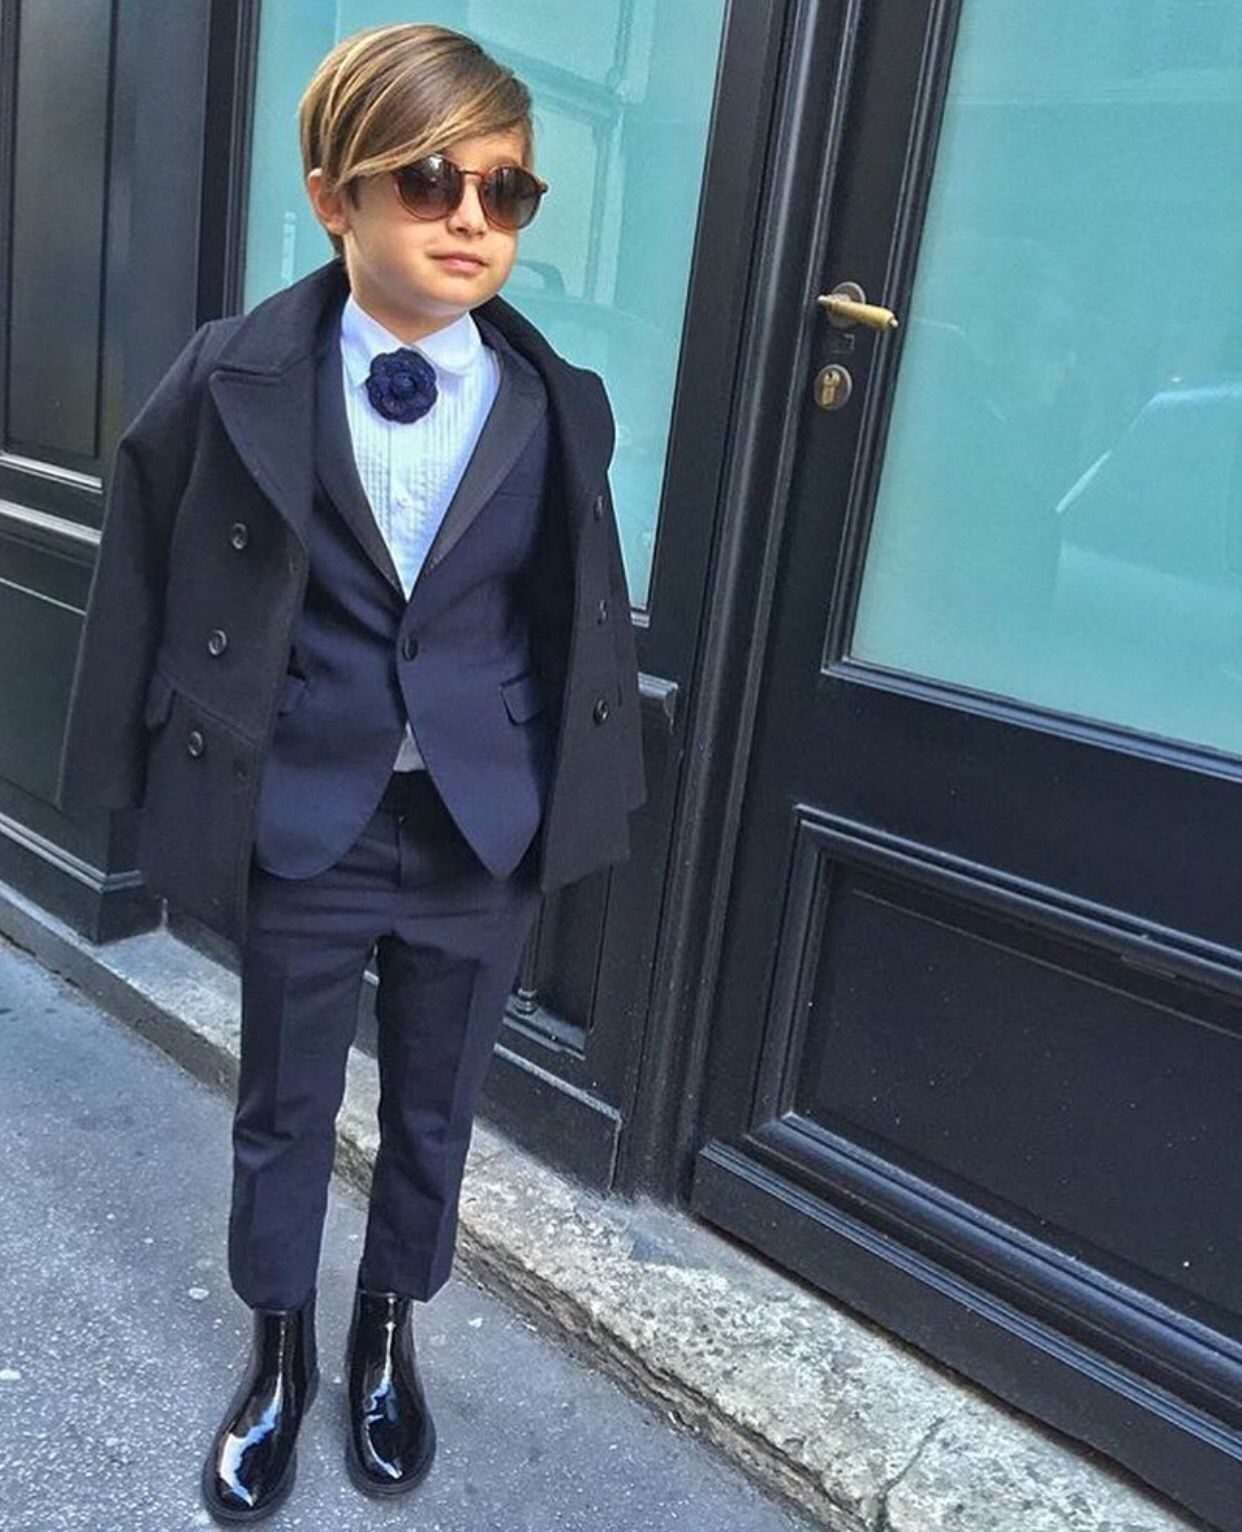 Alonso Mateo Kids Fashion Pinterest Alonso Mateo Fashion - Meet 5 year old alonso mateo best dressed kid ever seen